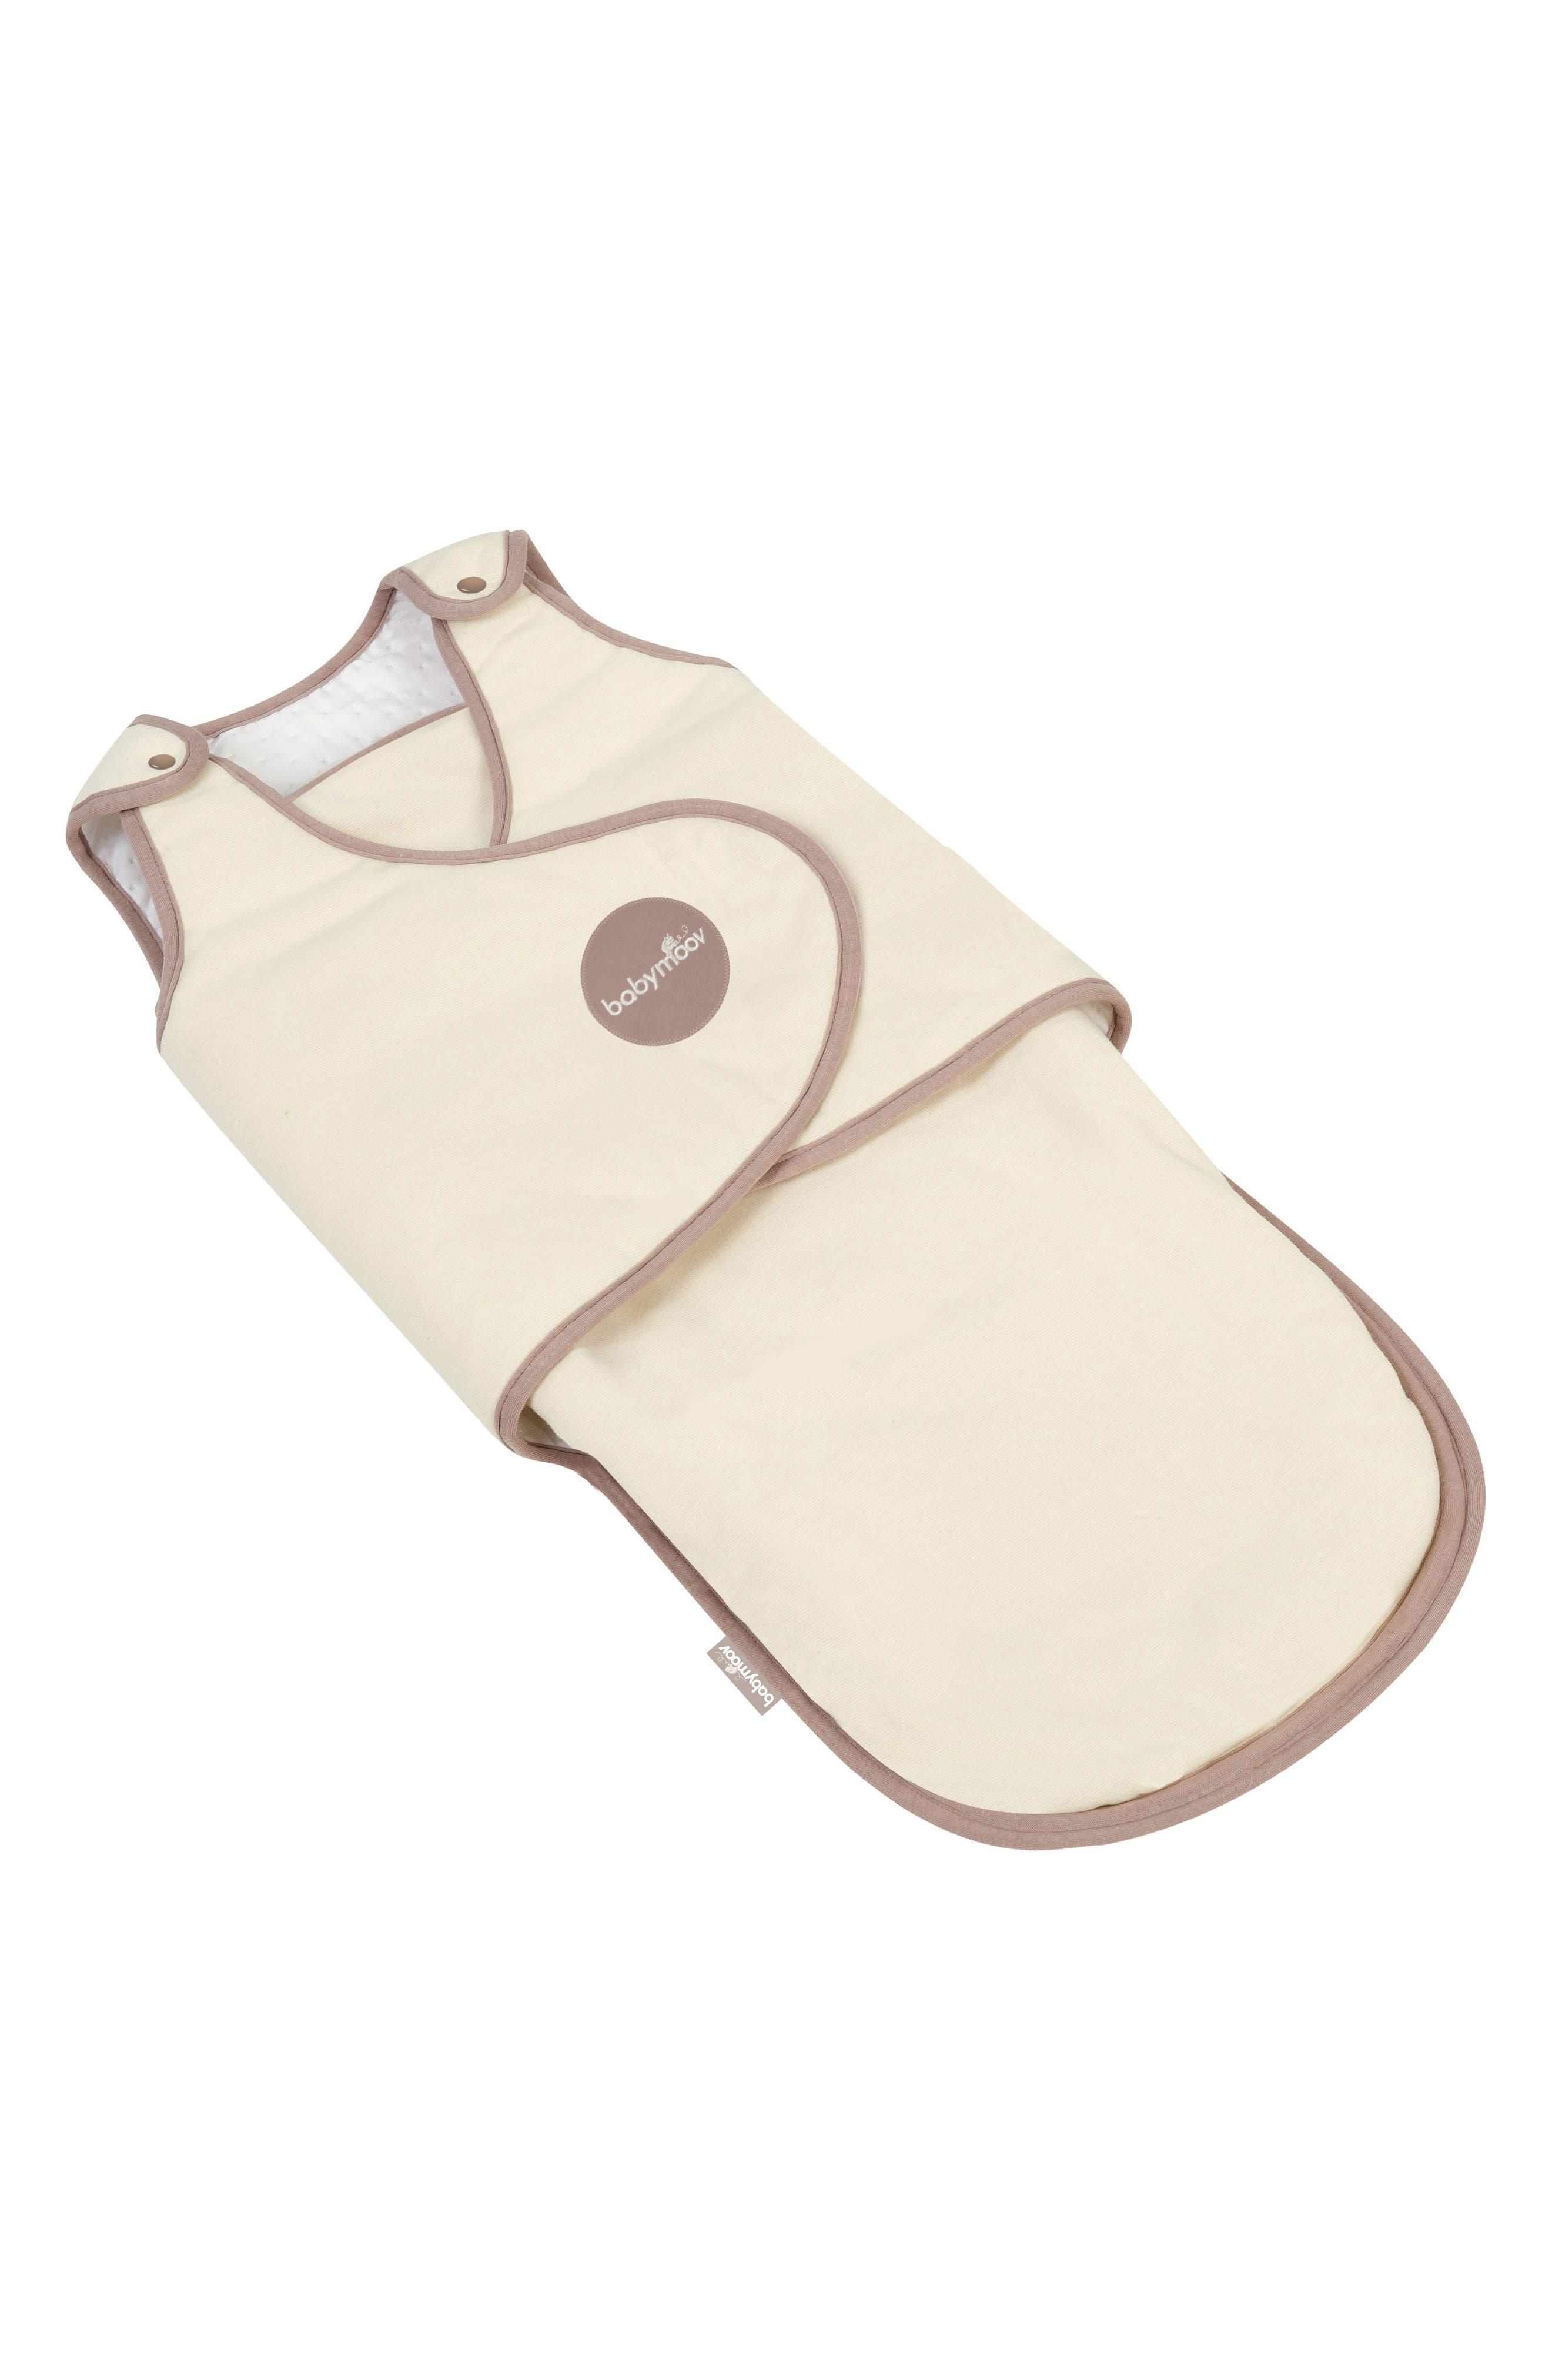 Main Image - Babymoov CosyBag Swaddle Wrap Blanket